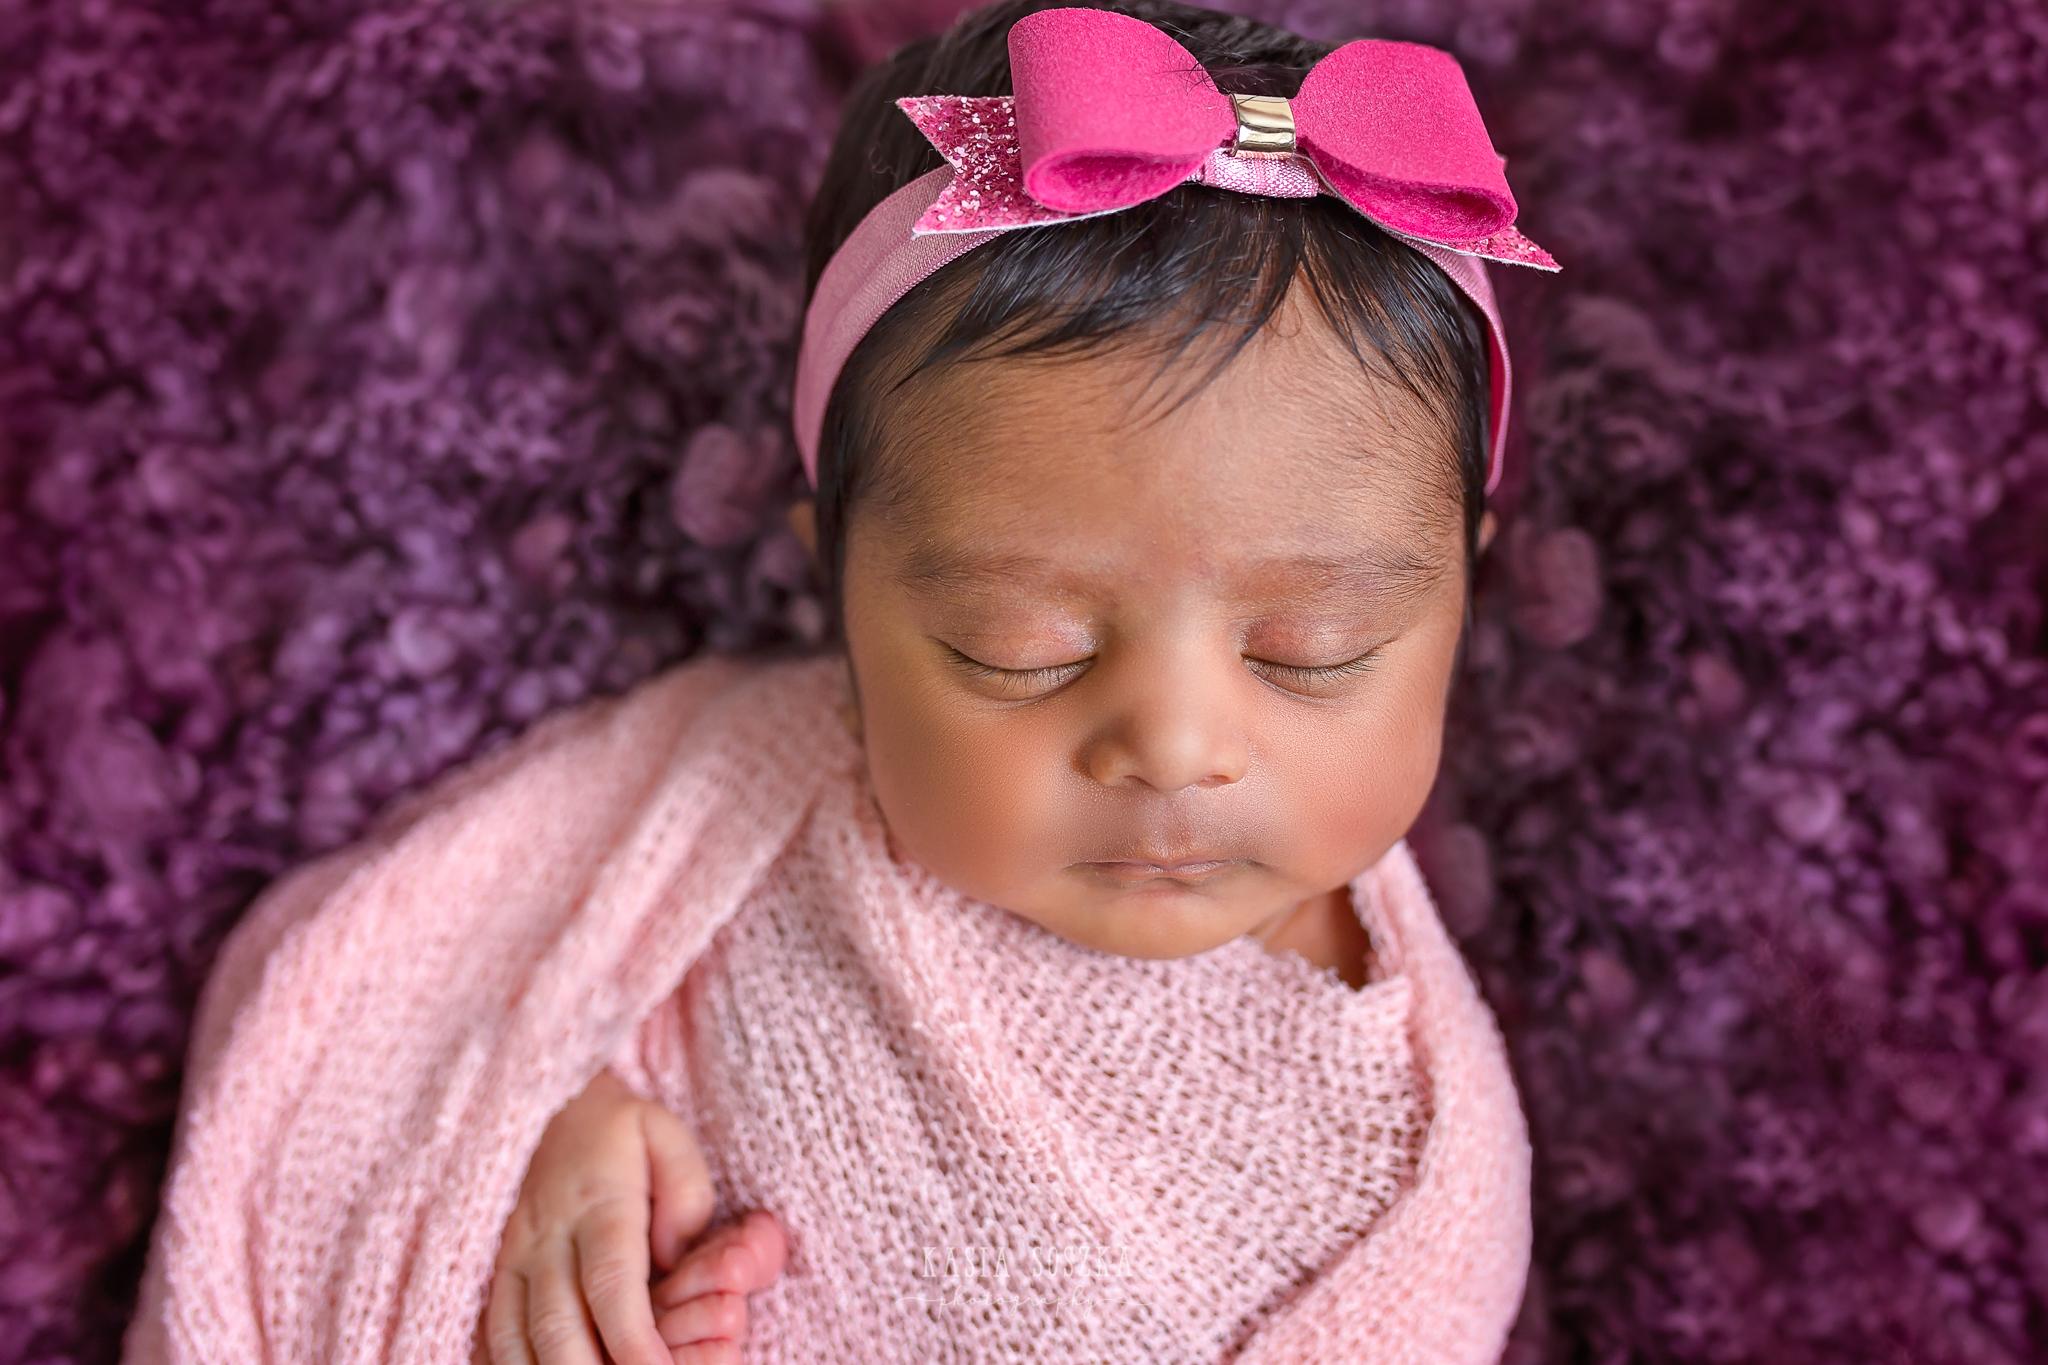 Newborn photography Leeds-Bradford-York-Harrogate: newborn baby girl wrapped in a pink blanket